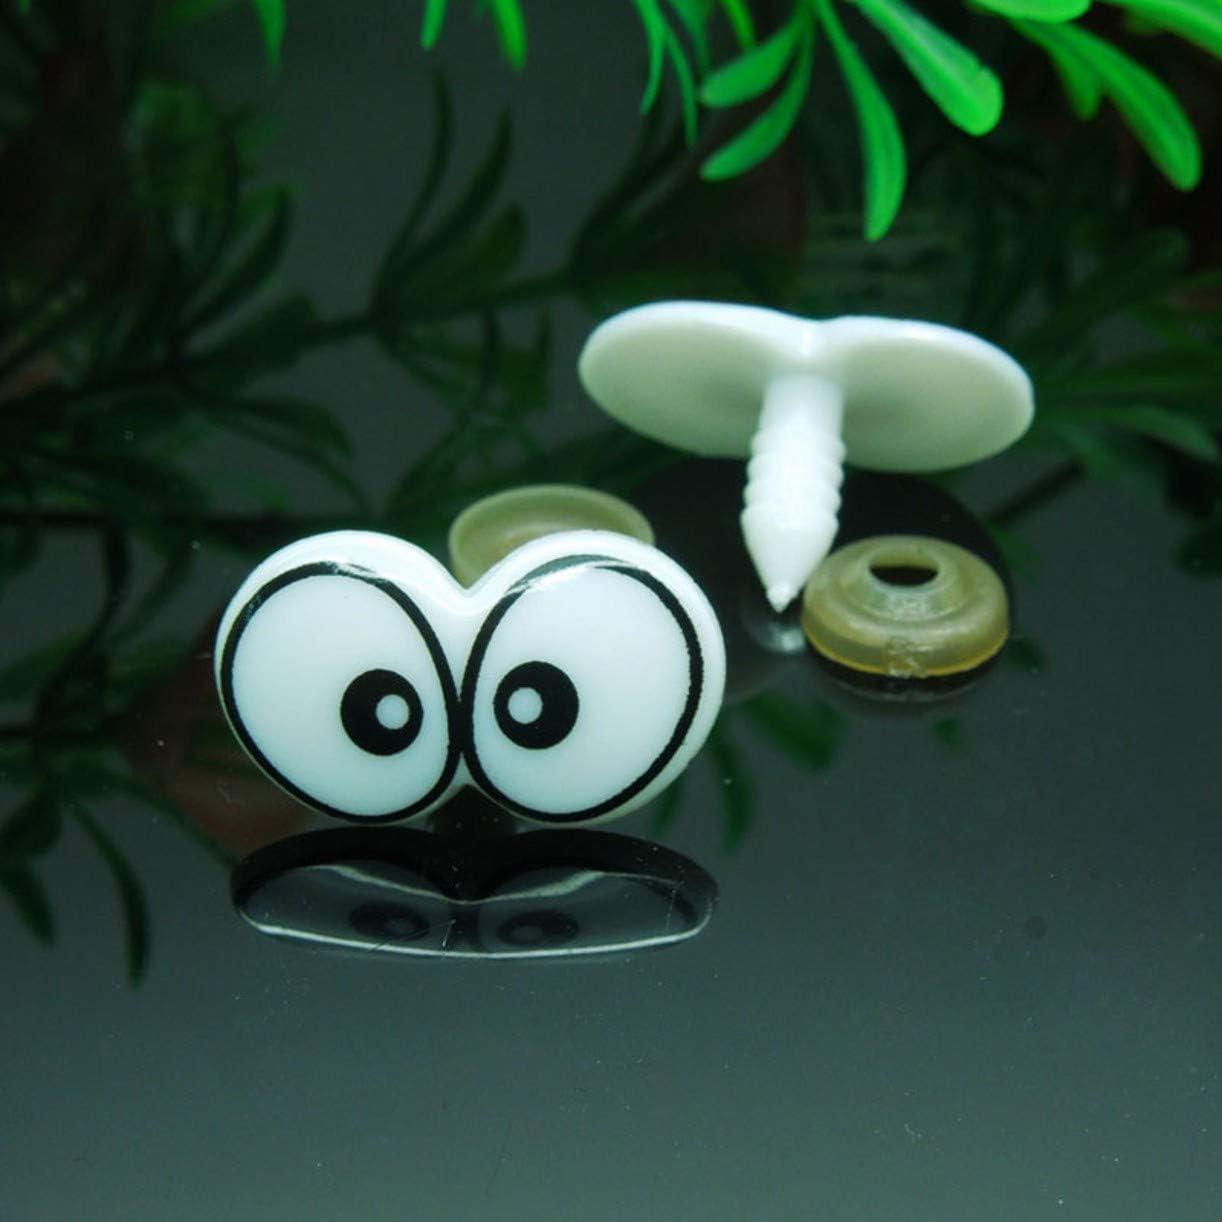 ZHONGJIUYUAN 50 Pieces White//Black Cartoon Plastic Safety Toy Eye Handmade Accessories for DIY Plush Dolls Animal Puppet Making